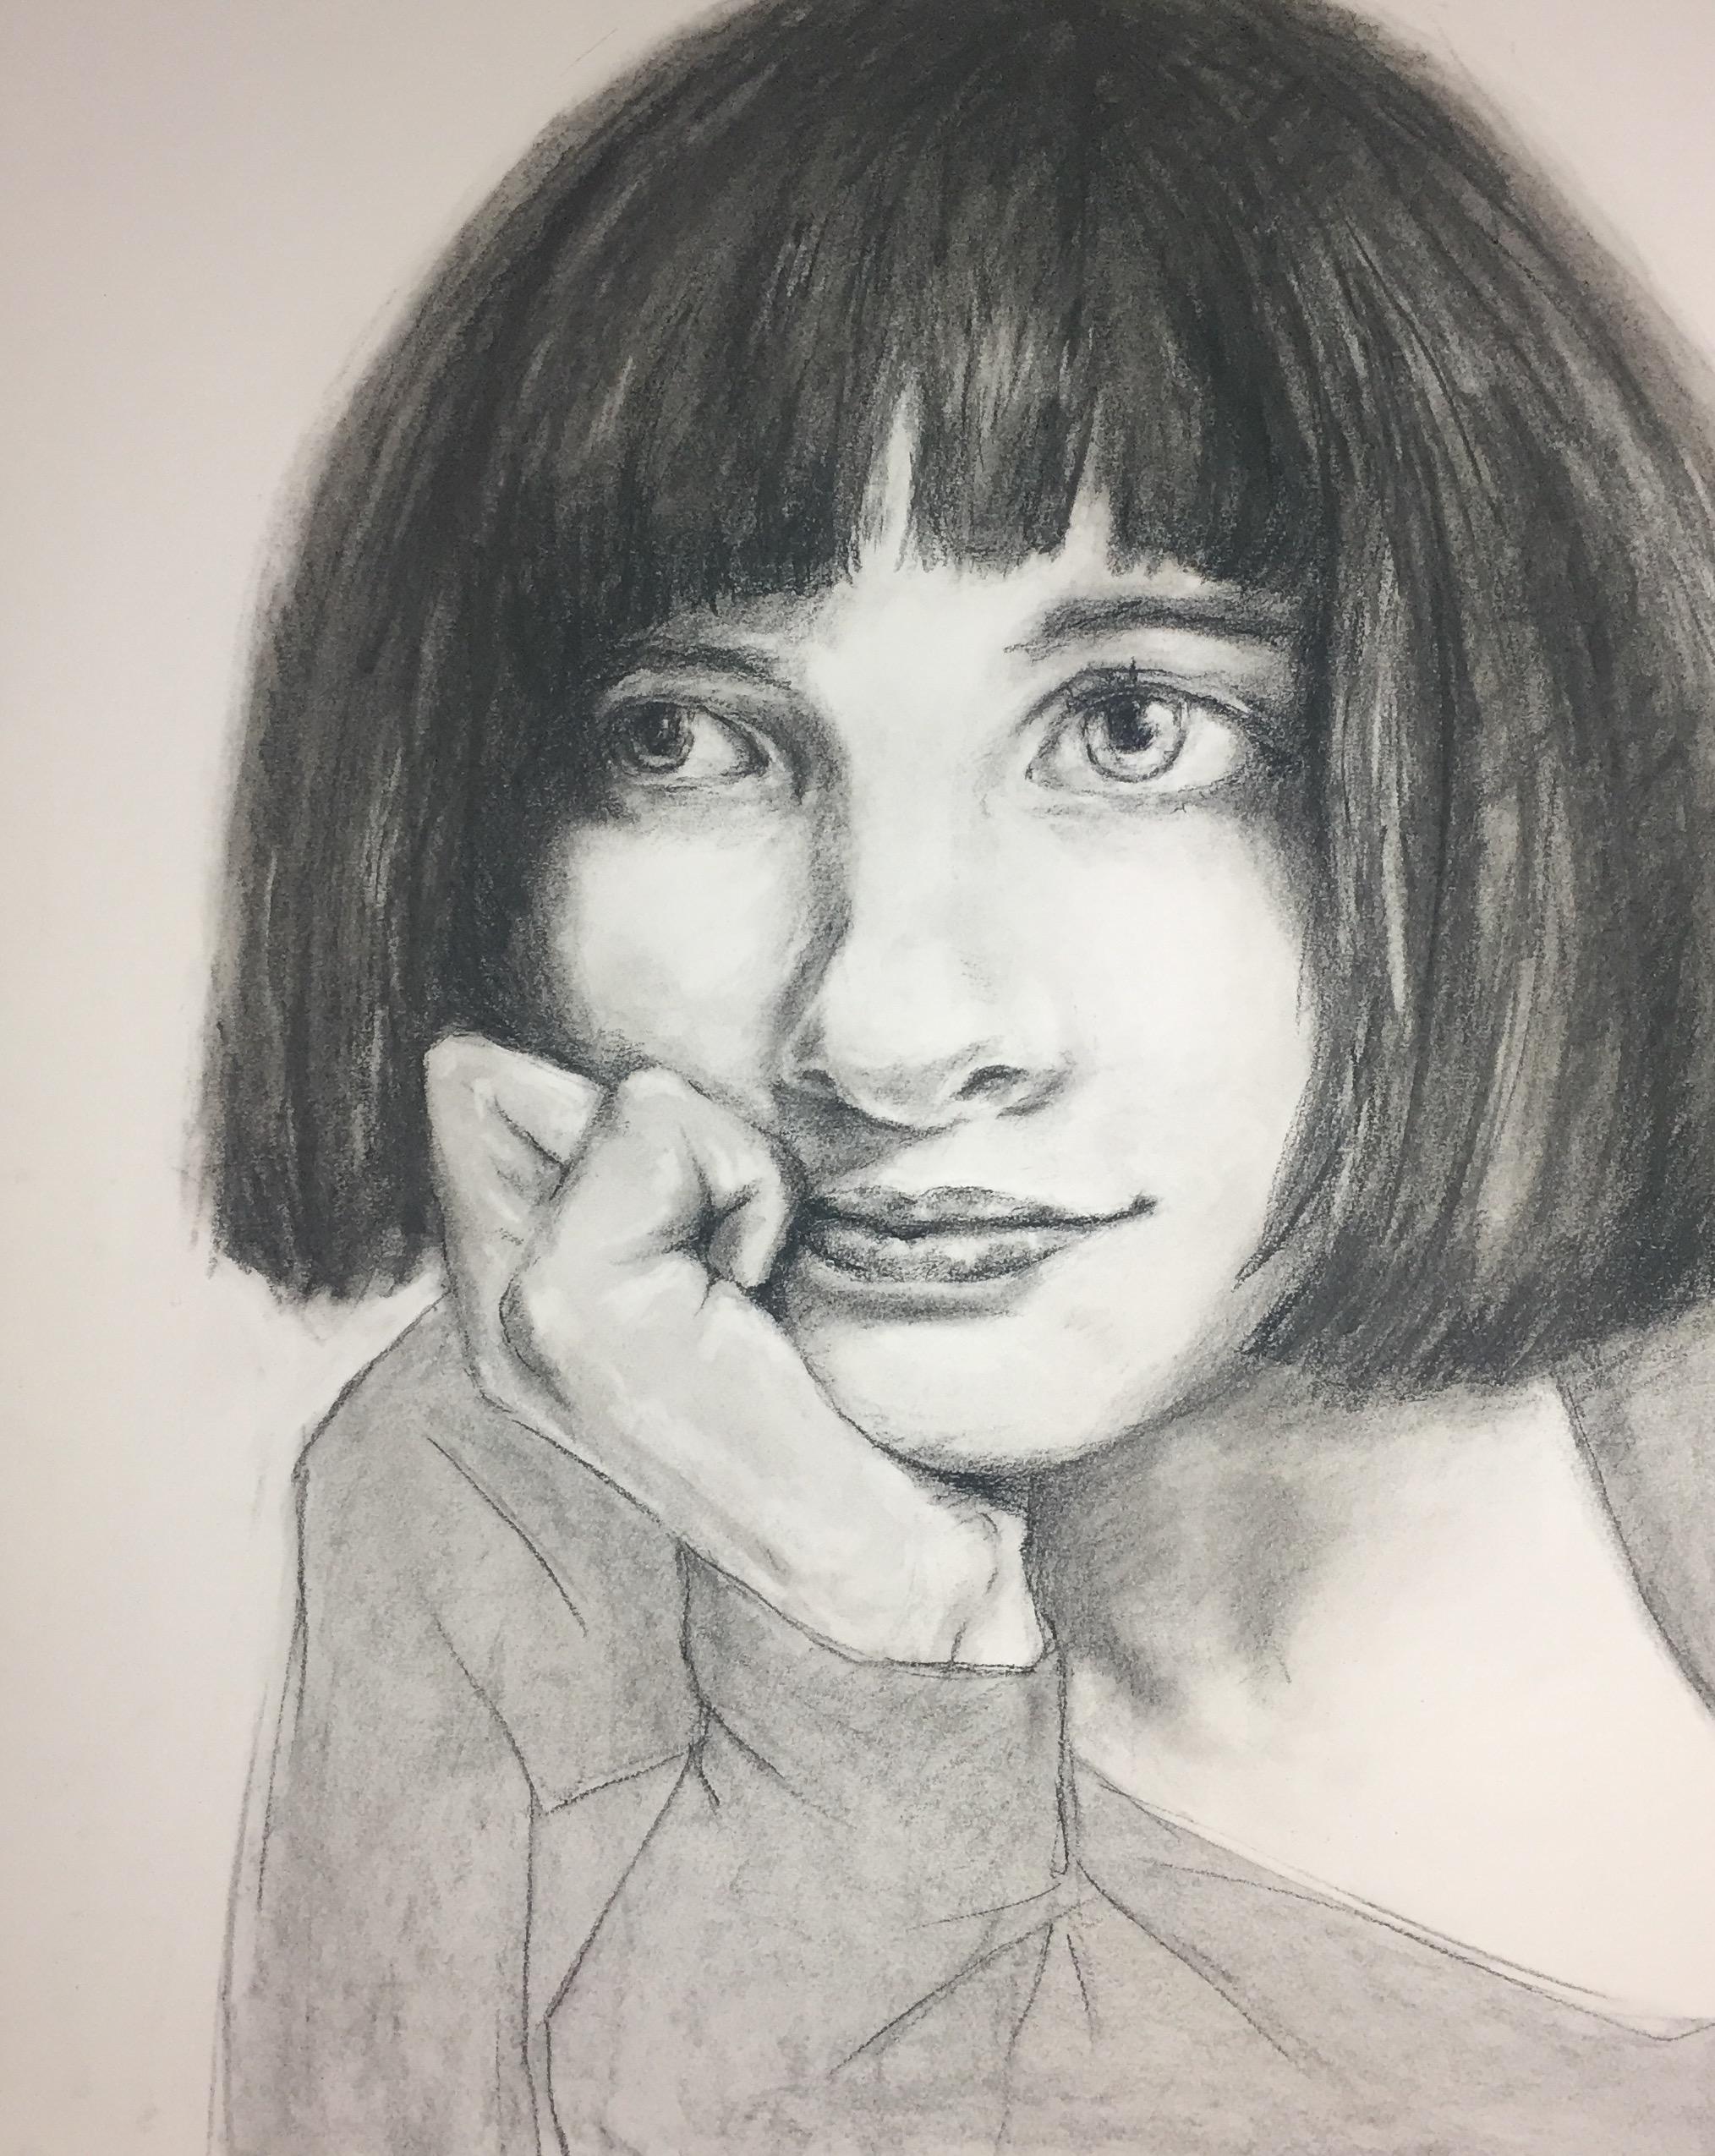 dartily drawing